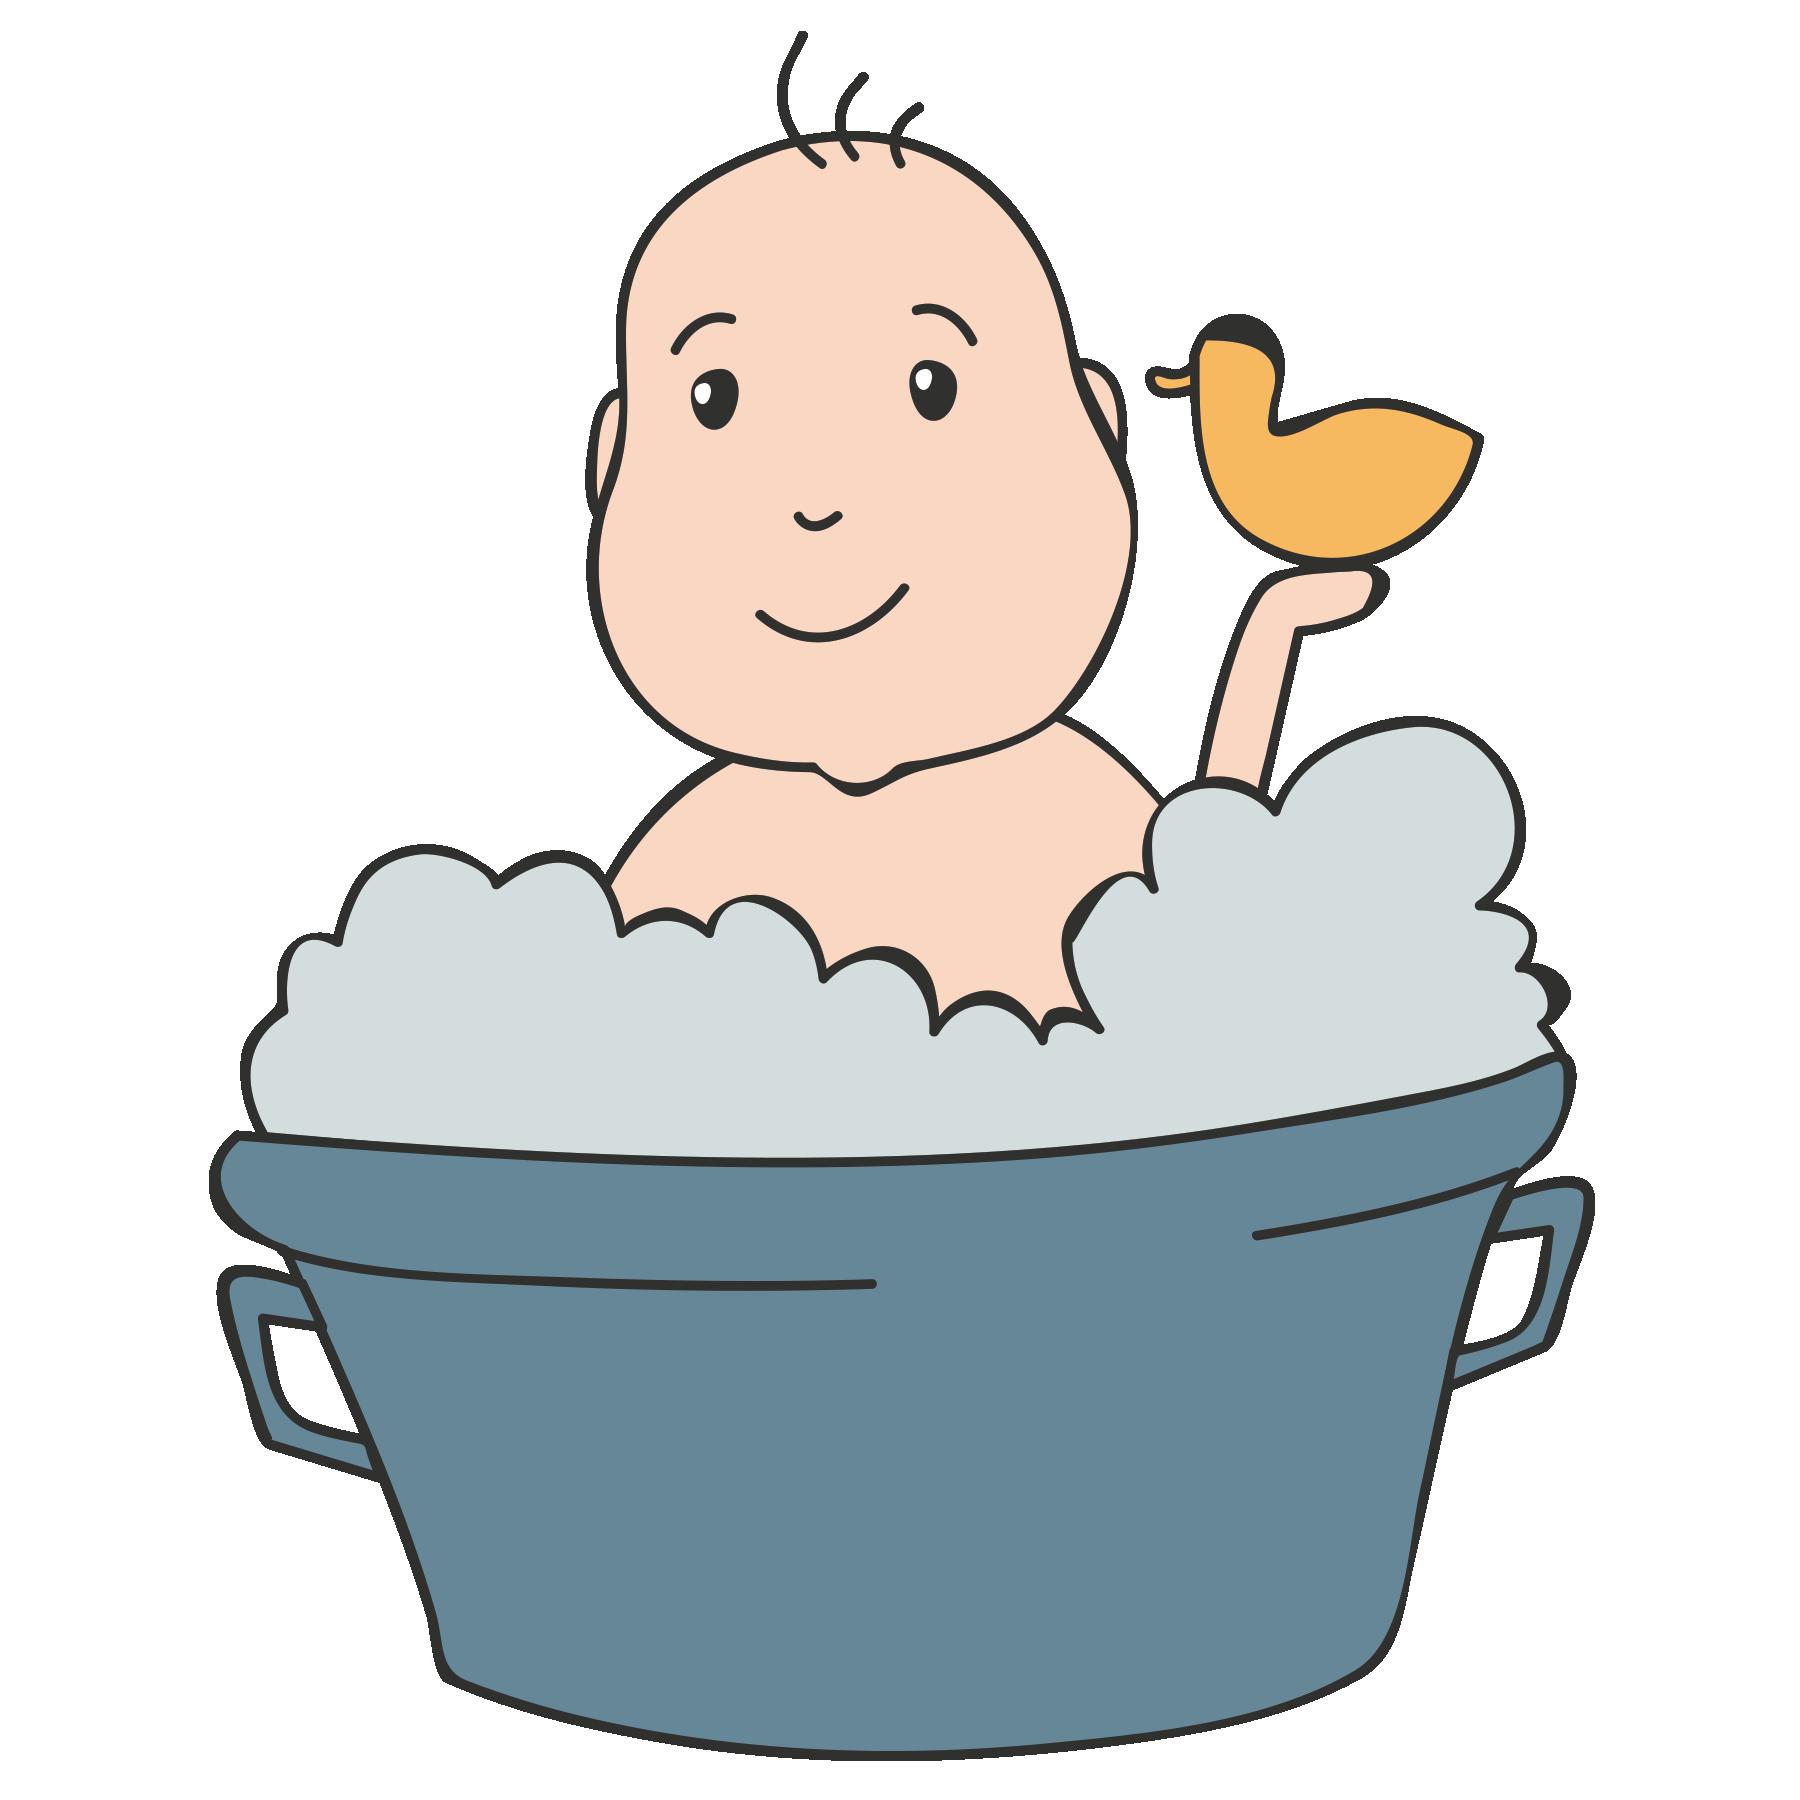 Baby bath tub clipart clip art library stock Baby in Bath Tub Vector clip art library stock